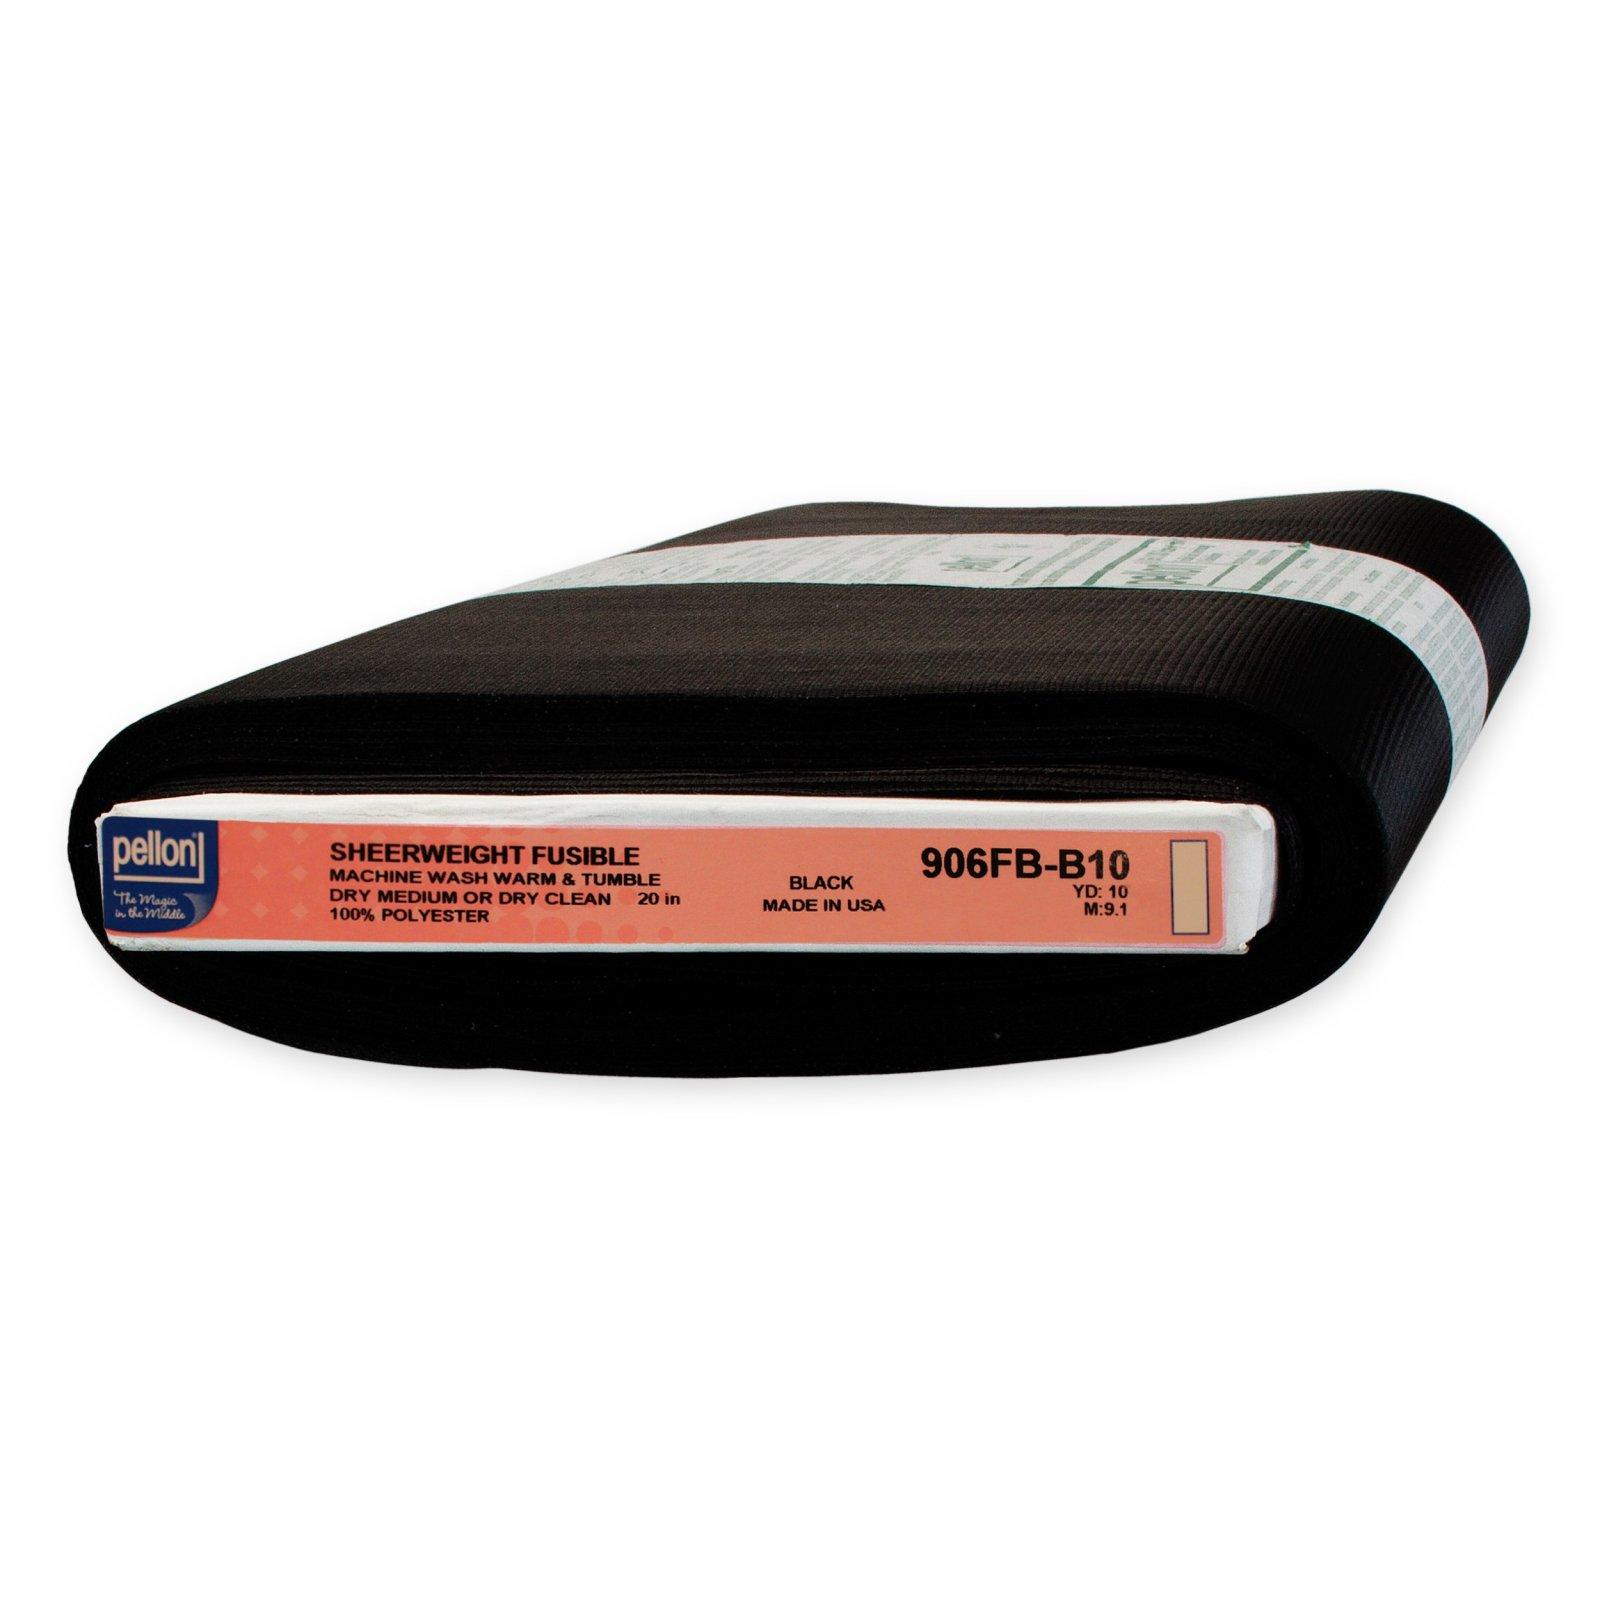 Interfacing - Pellon - 906F Nonwoven Polyester Fusible Sheerweight (Black)